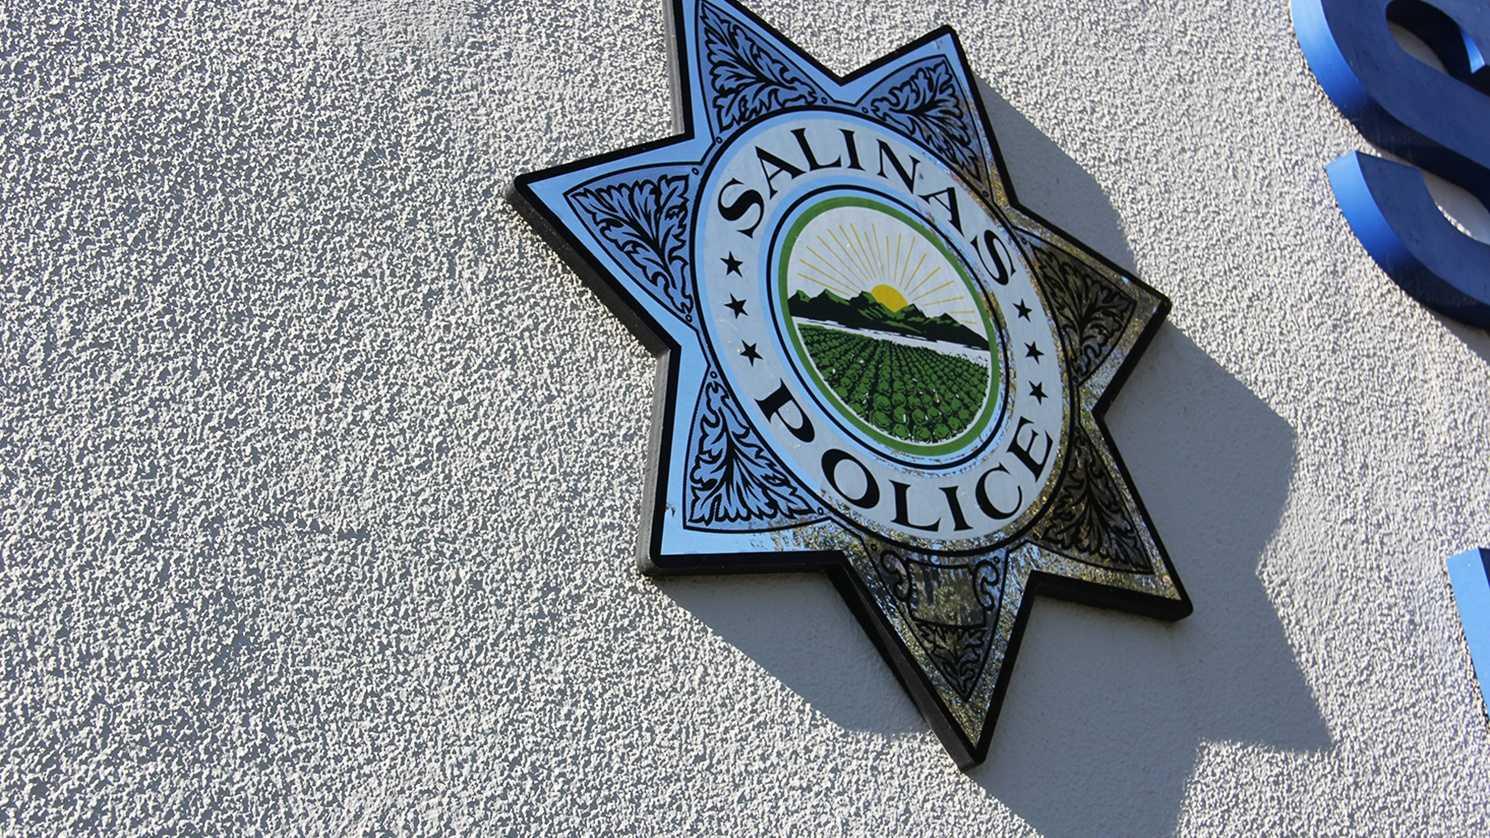 salinas police march11.jpg